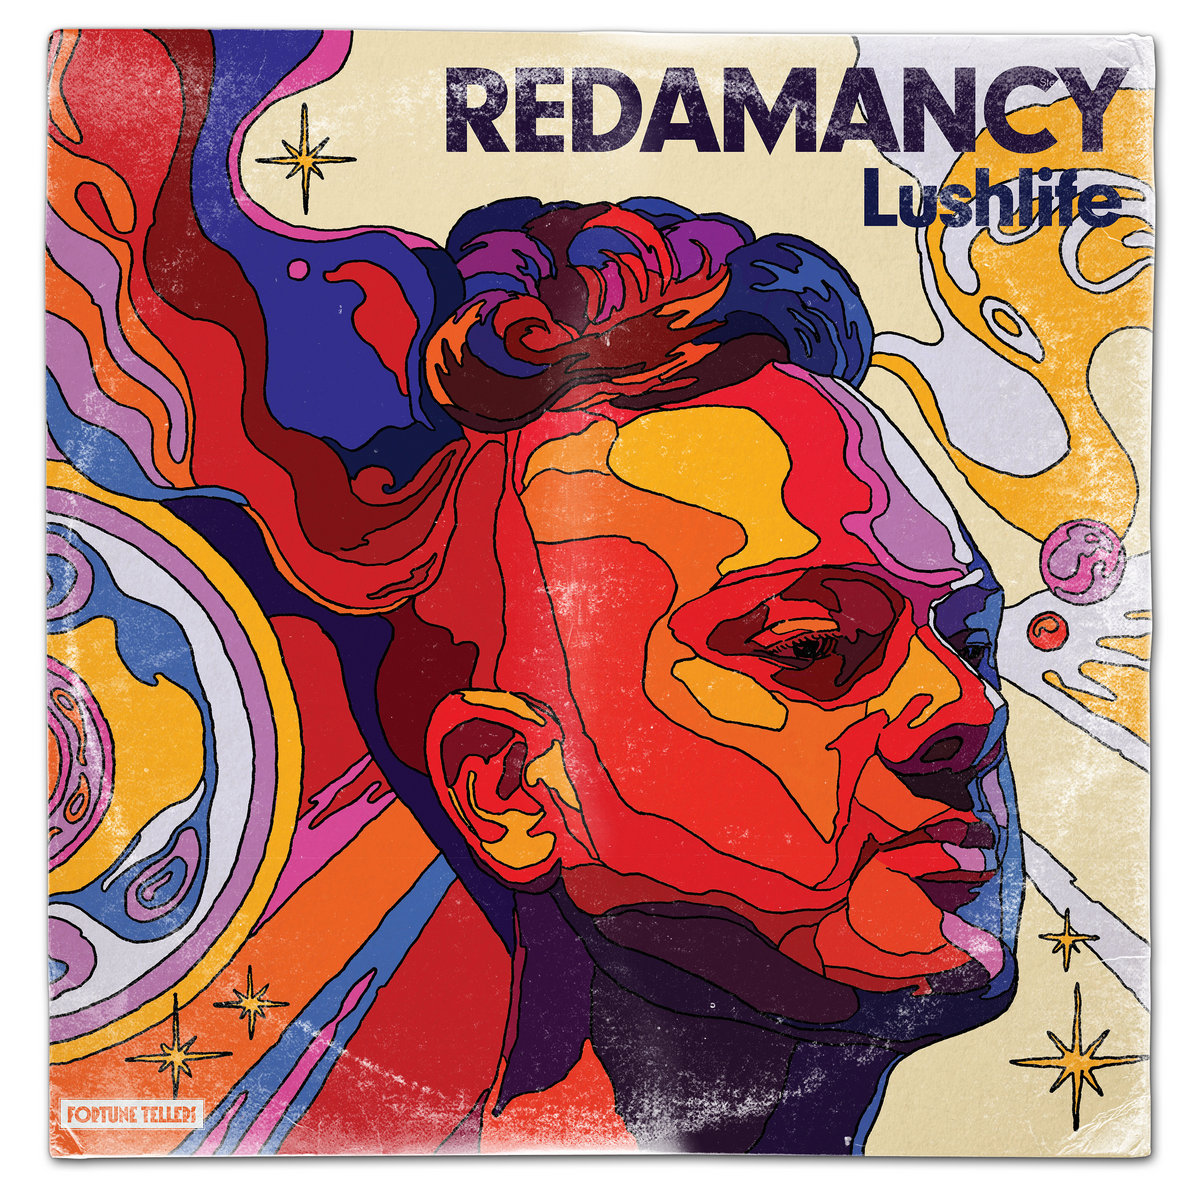 Album cover for Lushlife Redamancy.